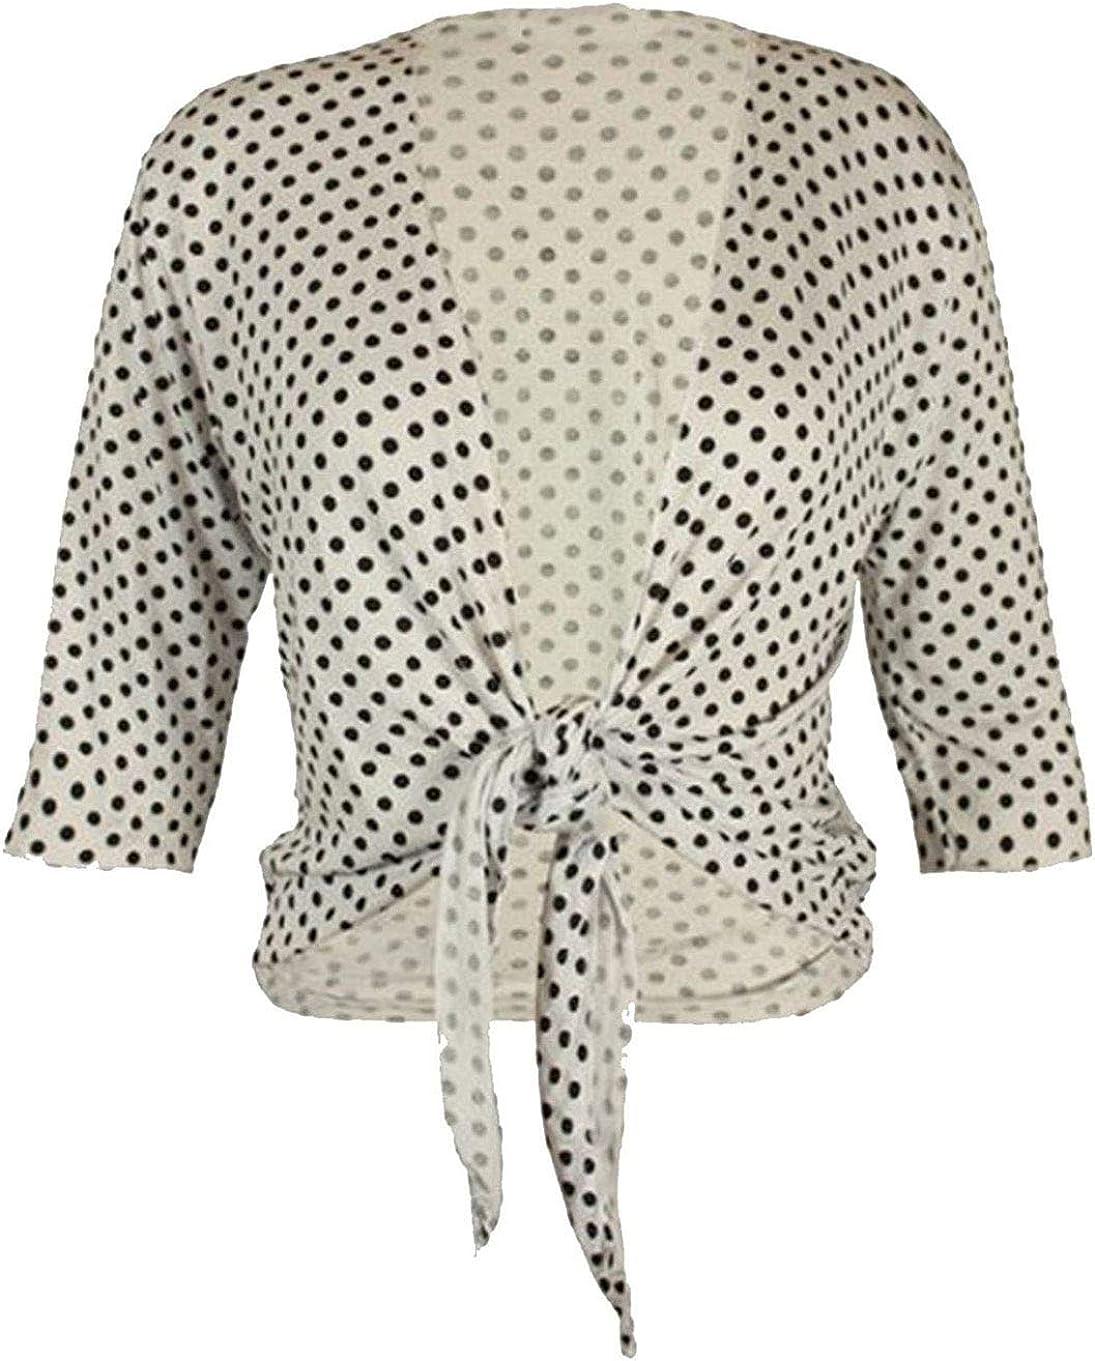 Womens Plain Party Wear 3/4 Polka Dot Tie Front Casual Bolero Cropped Cardigan Shrugs Shirt